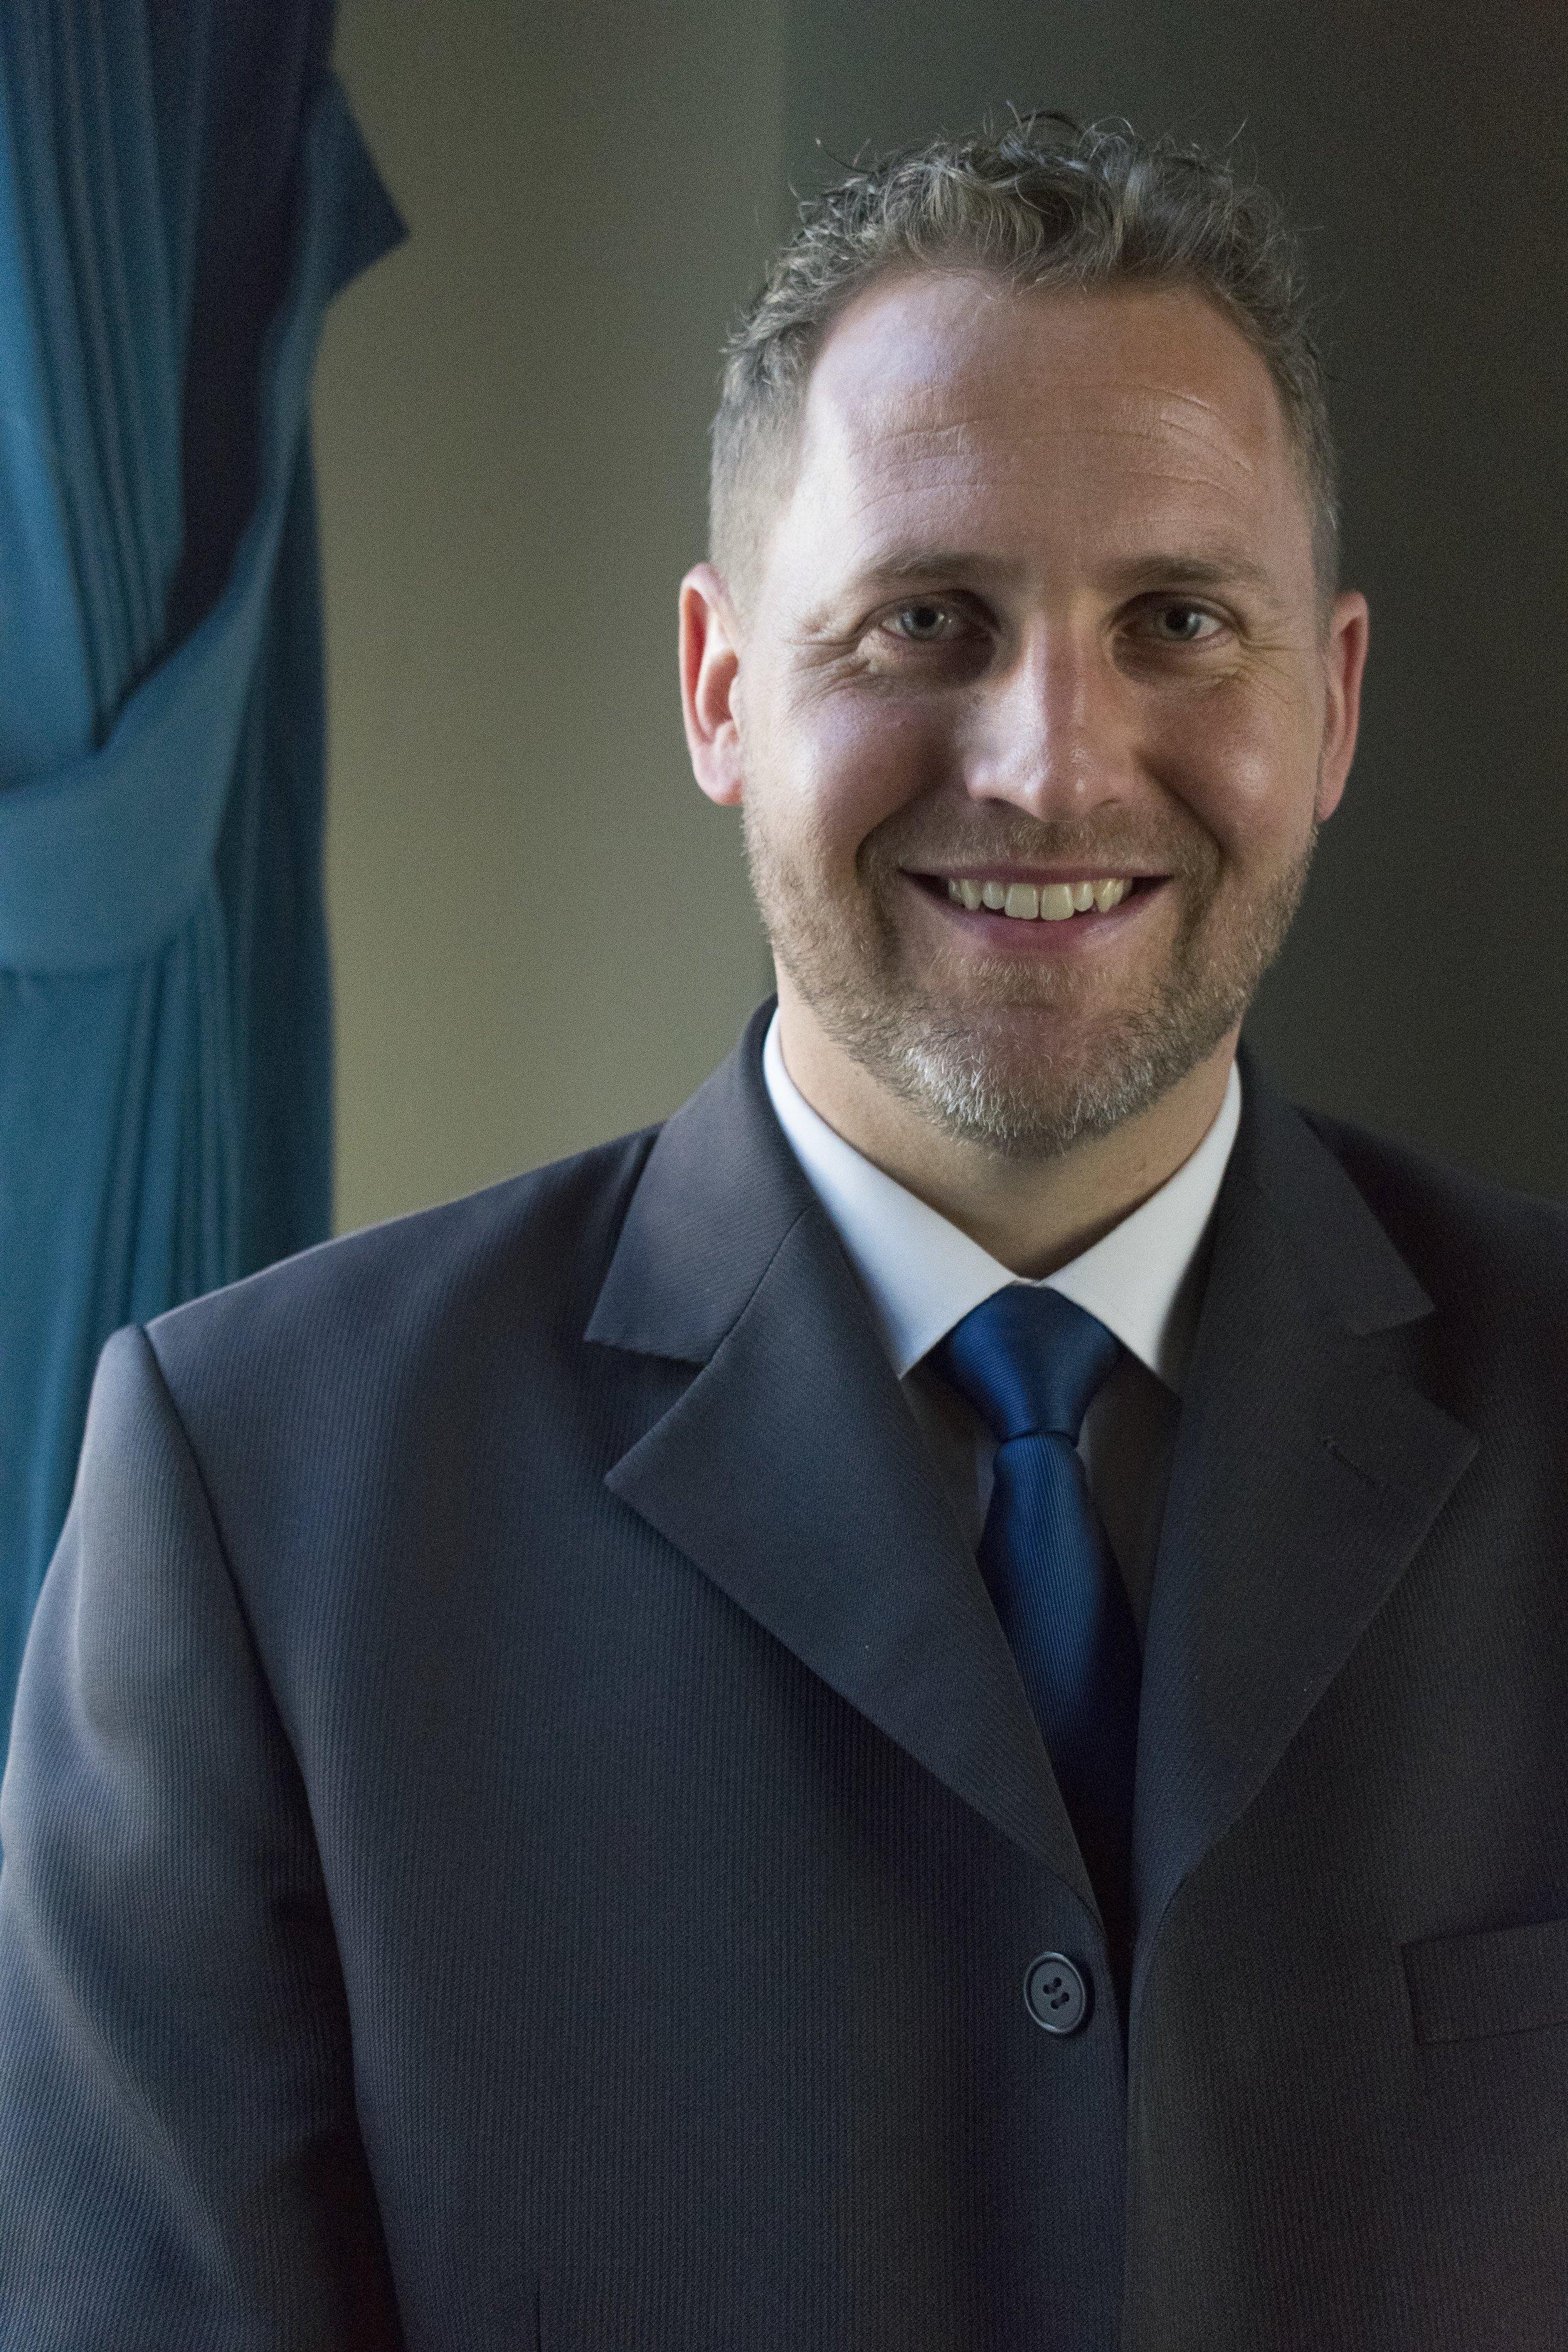 Wayne Thorley Deputy Secretary for Elections (775) 684-5705  wthorley@sos.nv.gov   Website